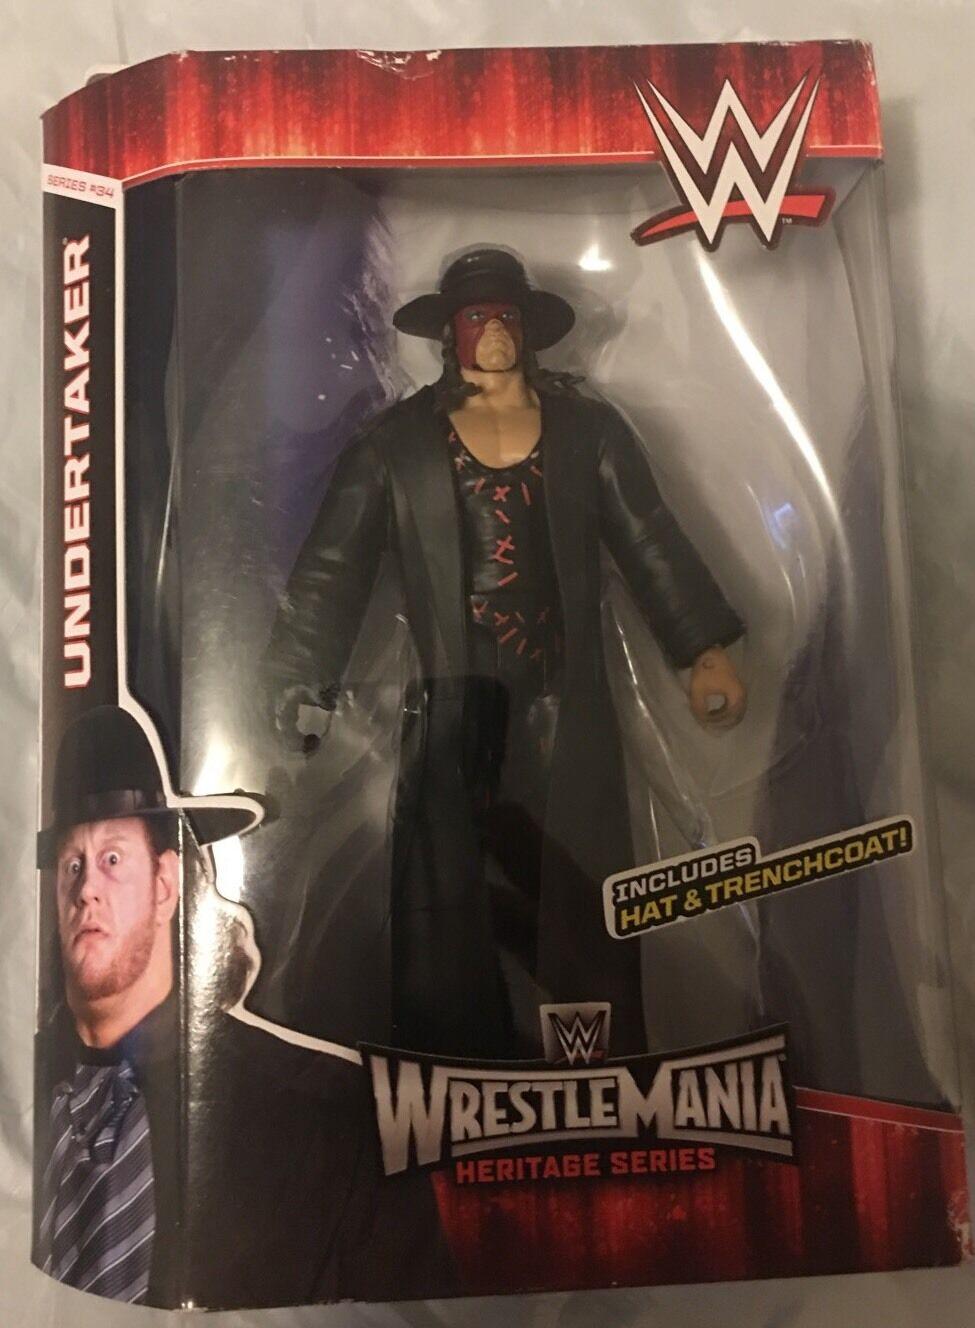 WWF WWE ELITE 31 34 Error Variante UNDERTAKER KANE underkane figura sin abrir